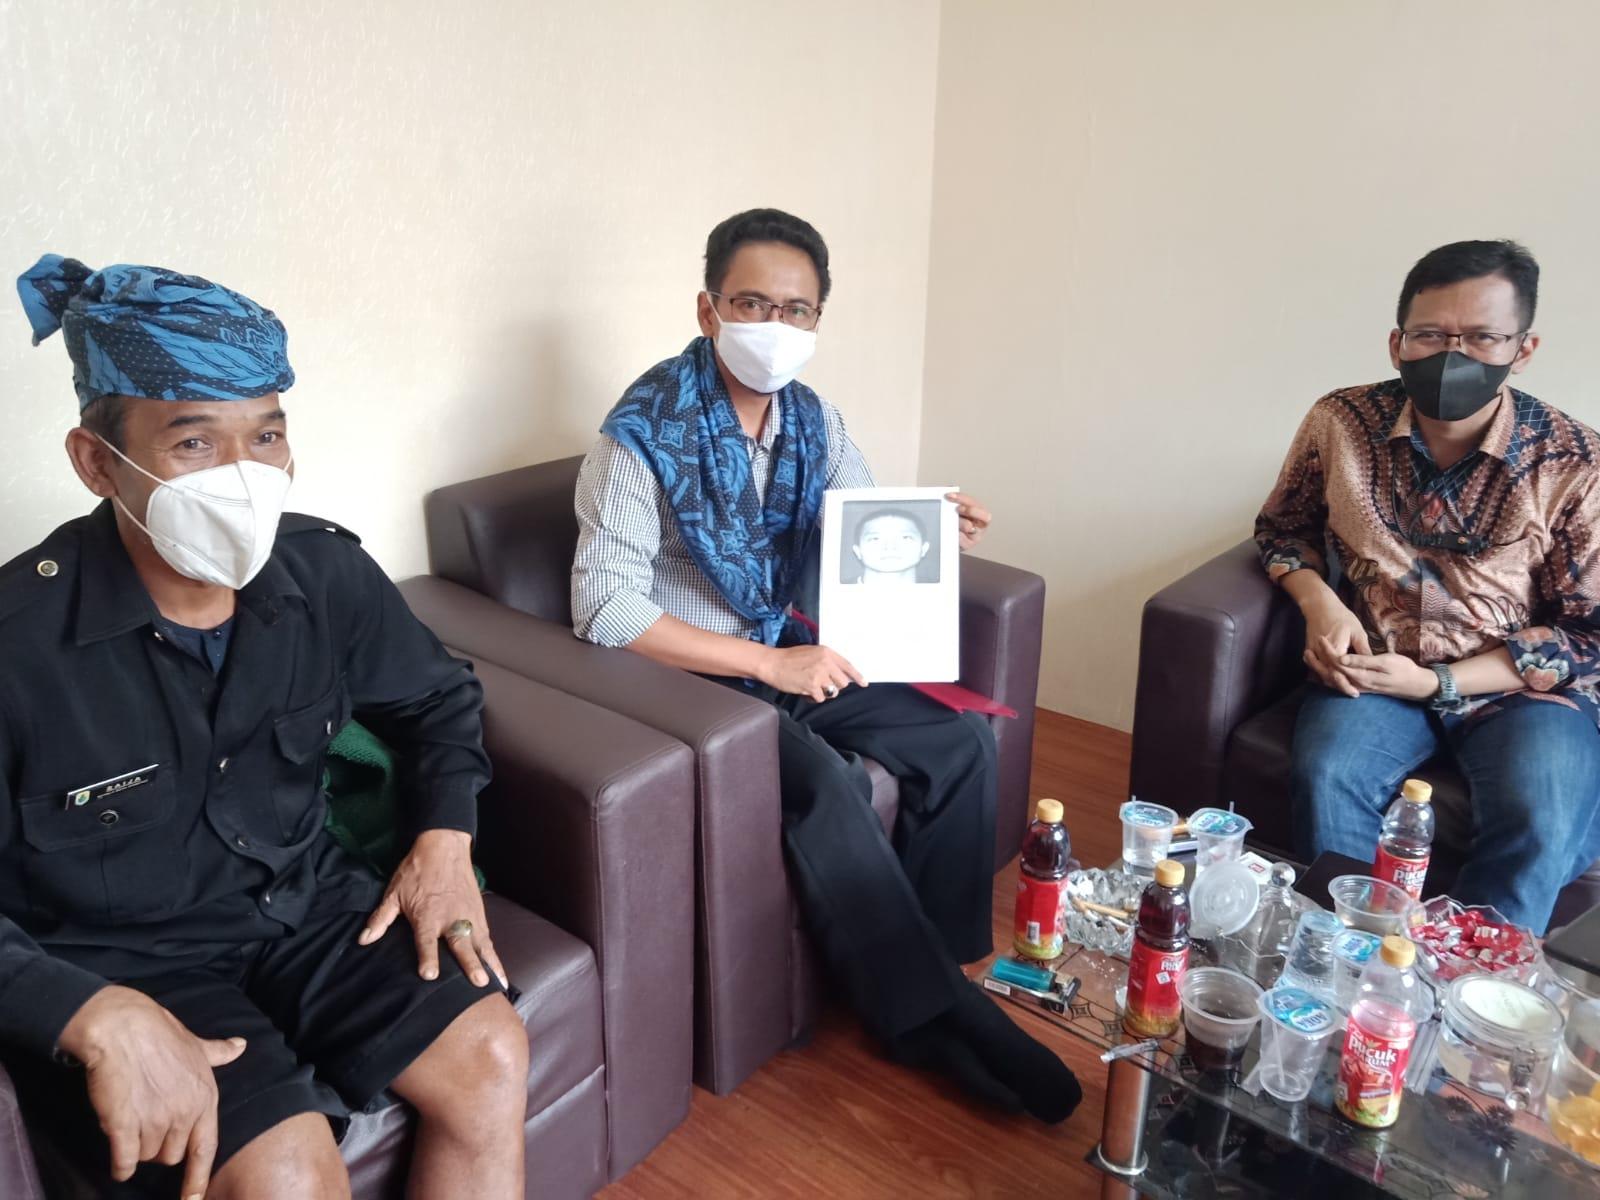 Lembaga Adat Baduy Turun Gunung Gara-gara Dugaan Penyebaran Hoaks oleh Mahasiswa Jakarta yang Tergabung Ampas Daya